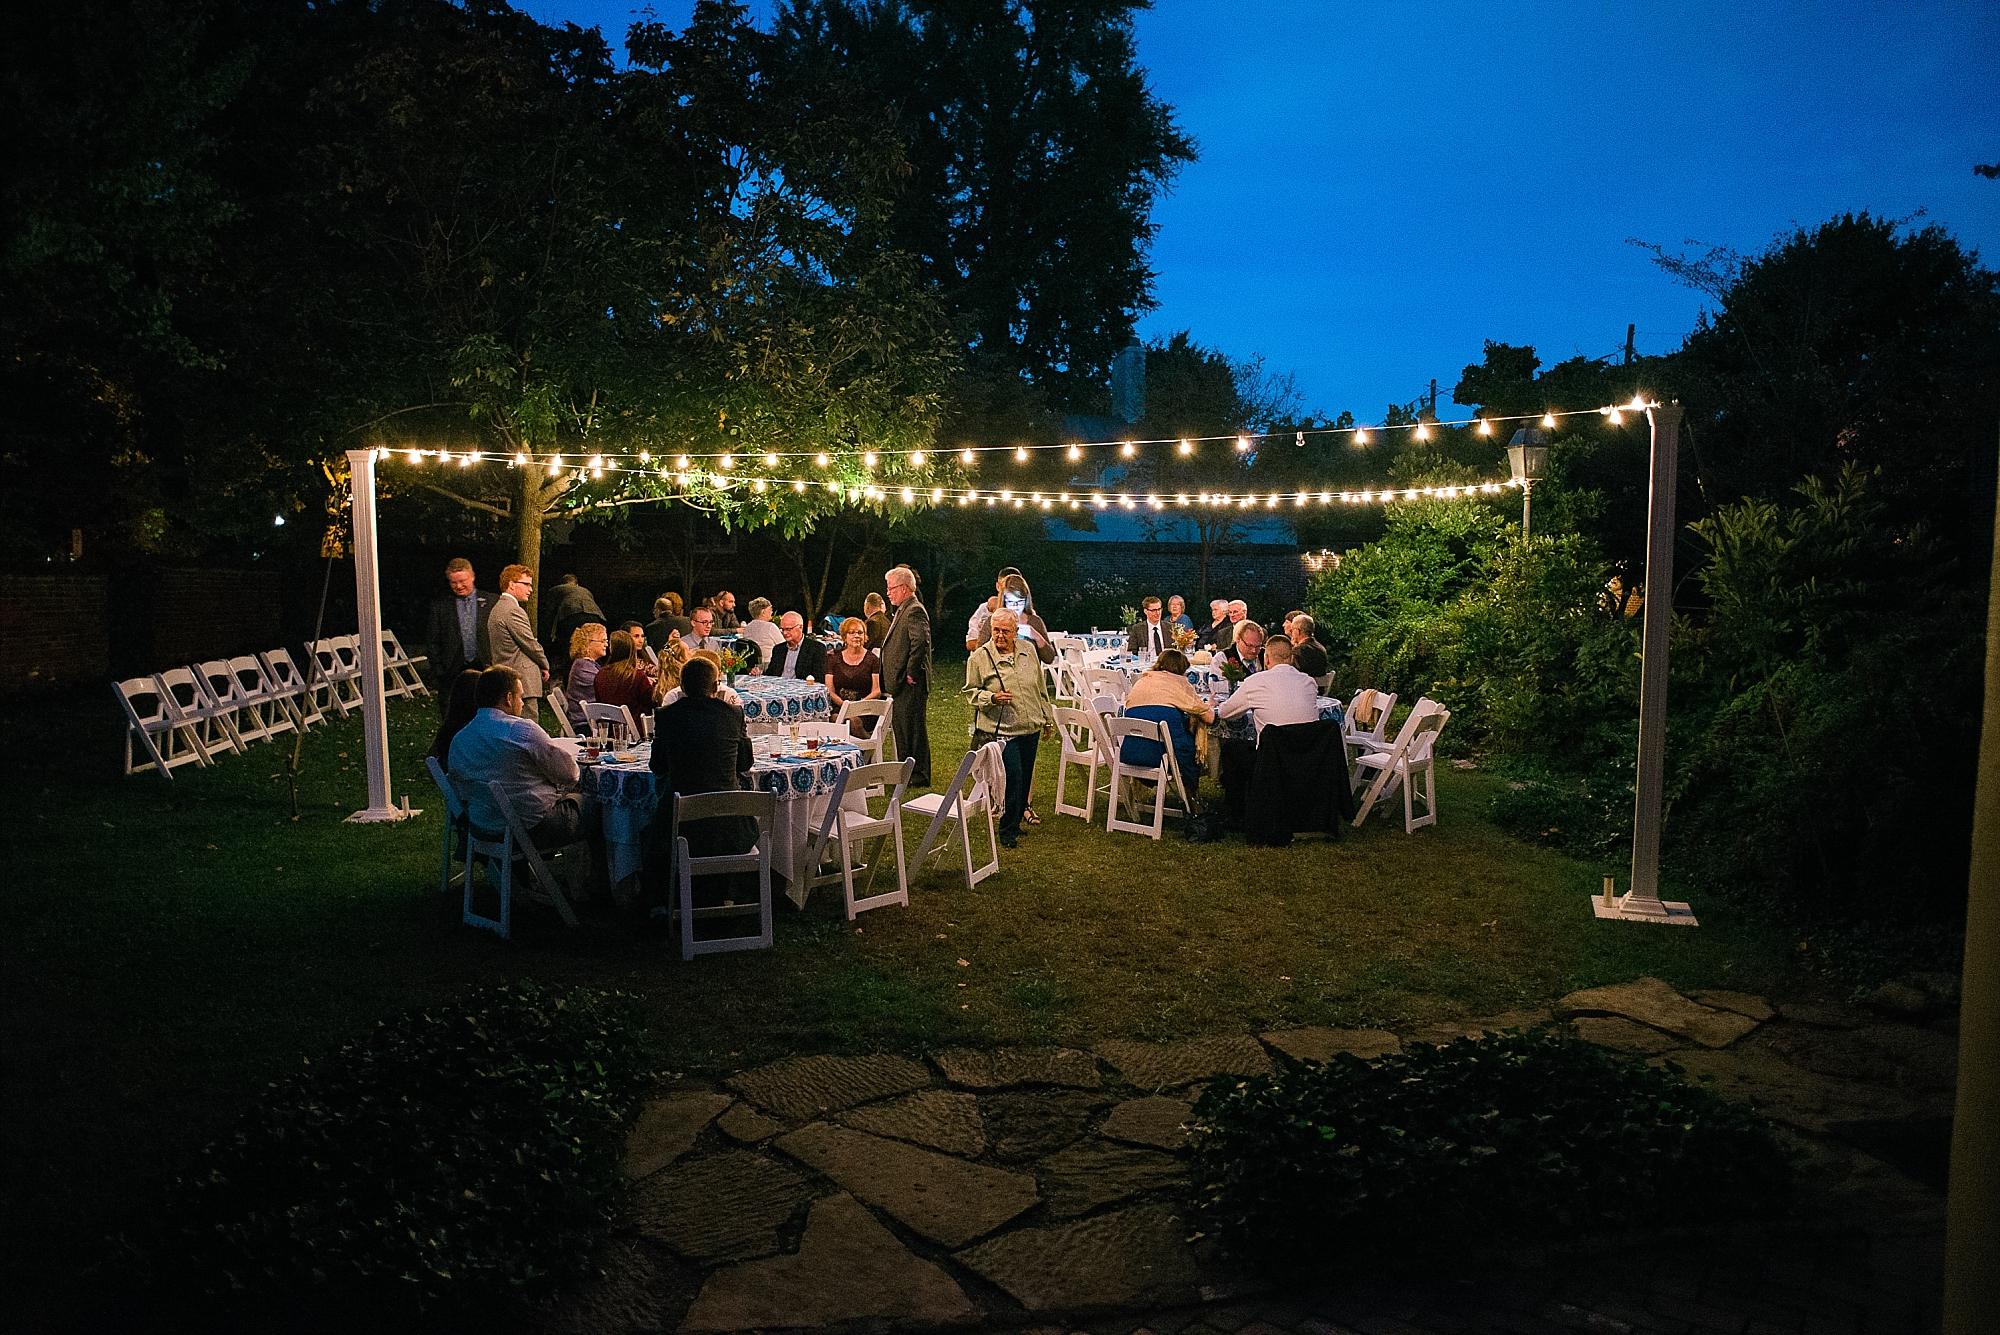 night-garden-party